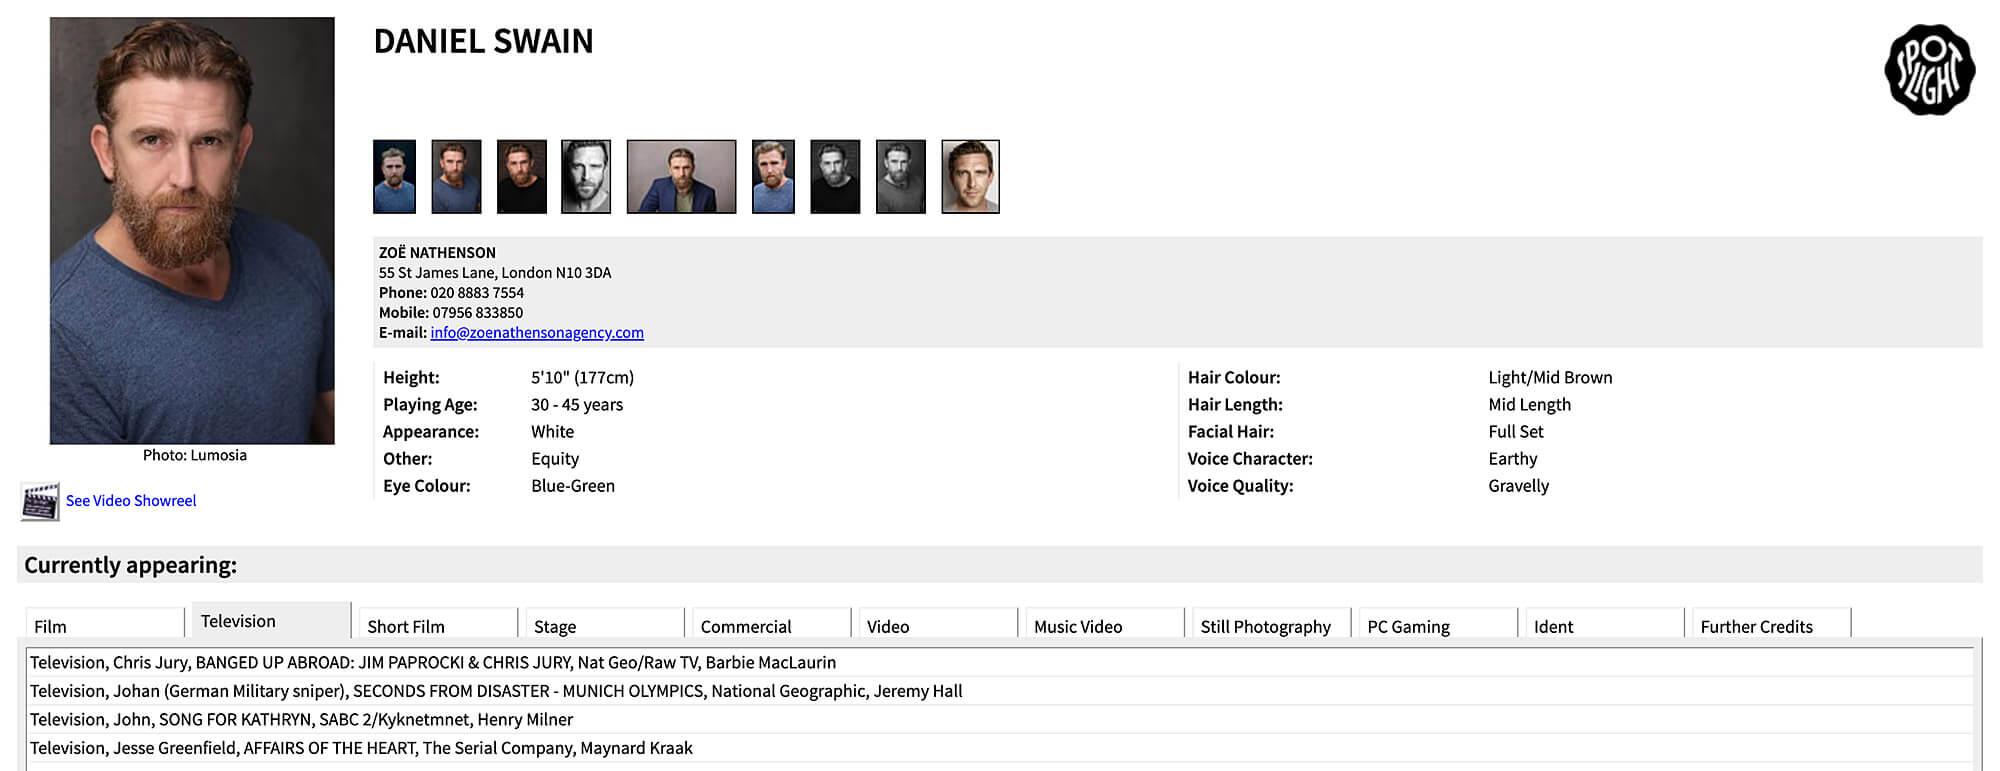 Spotlight-Actor-Profile-for-Daniel-Swain